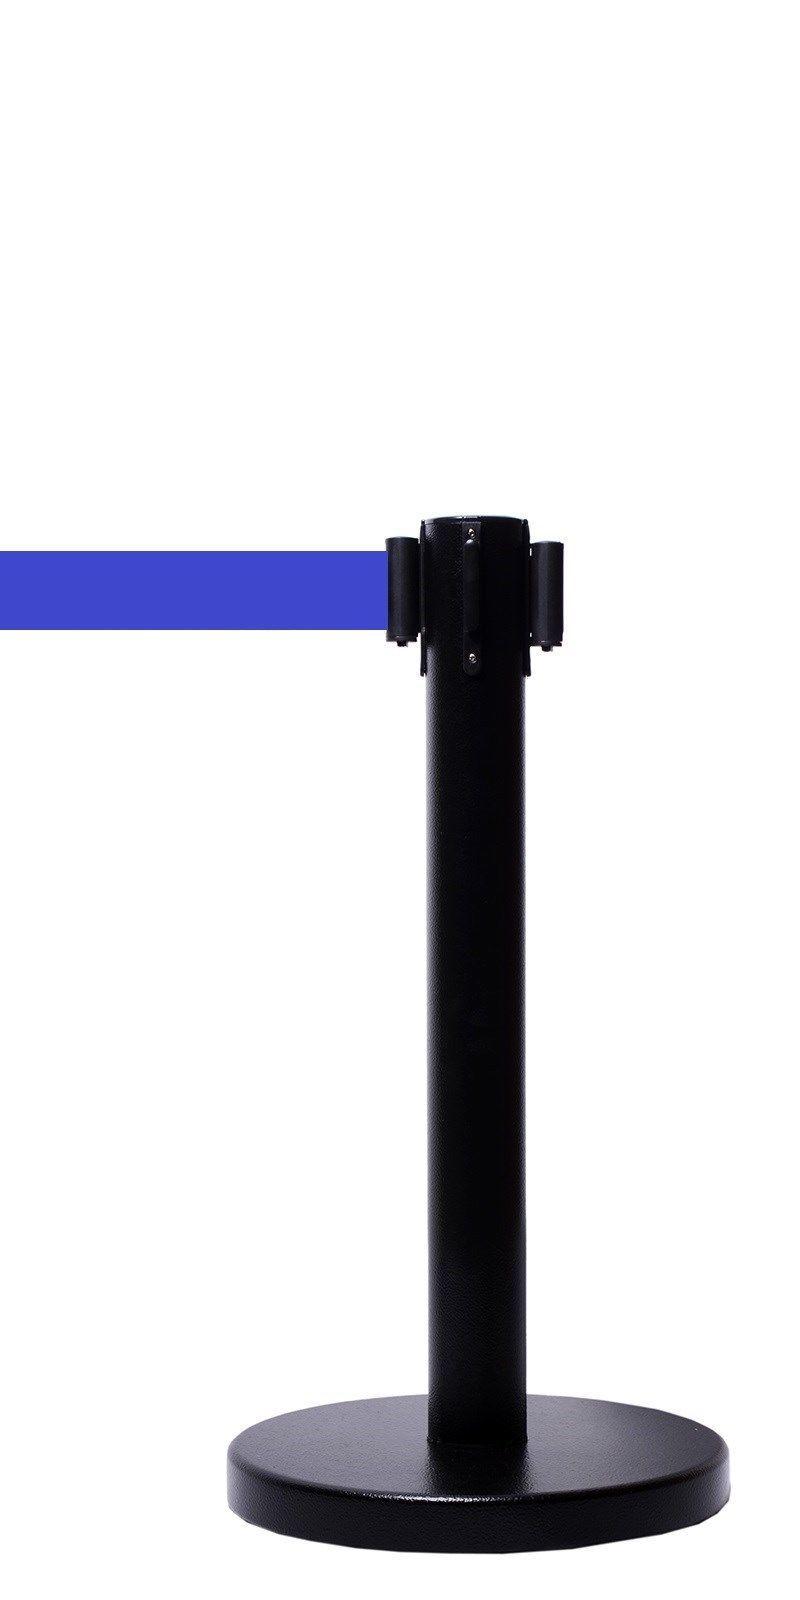 RETRACTABLE BELT STANCHION 2 PCS SET VIP CROWD CONTROL CUSTOM HEIGHT